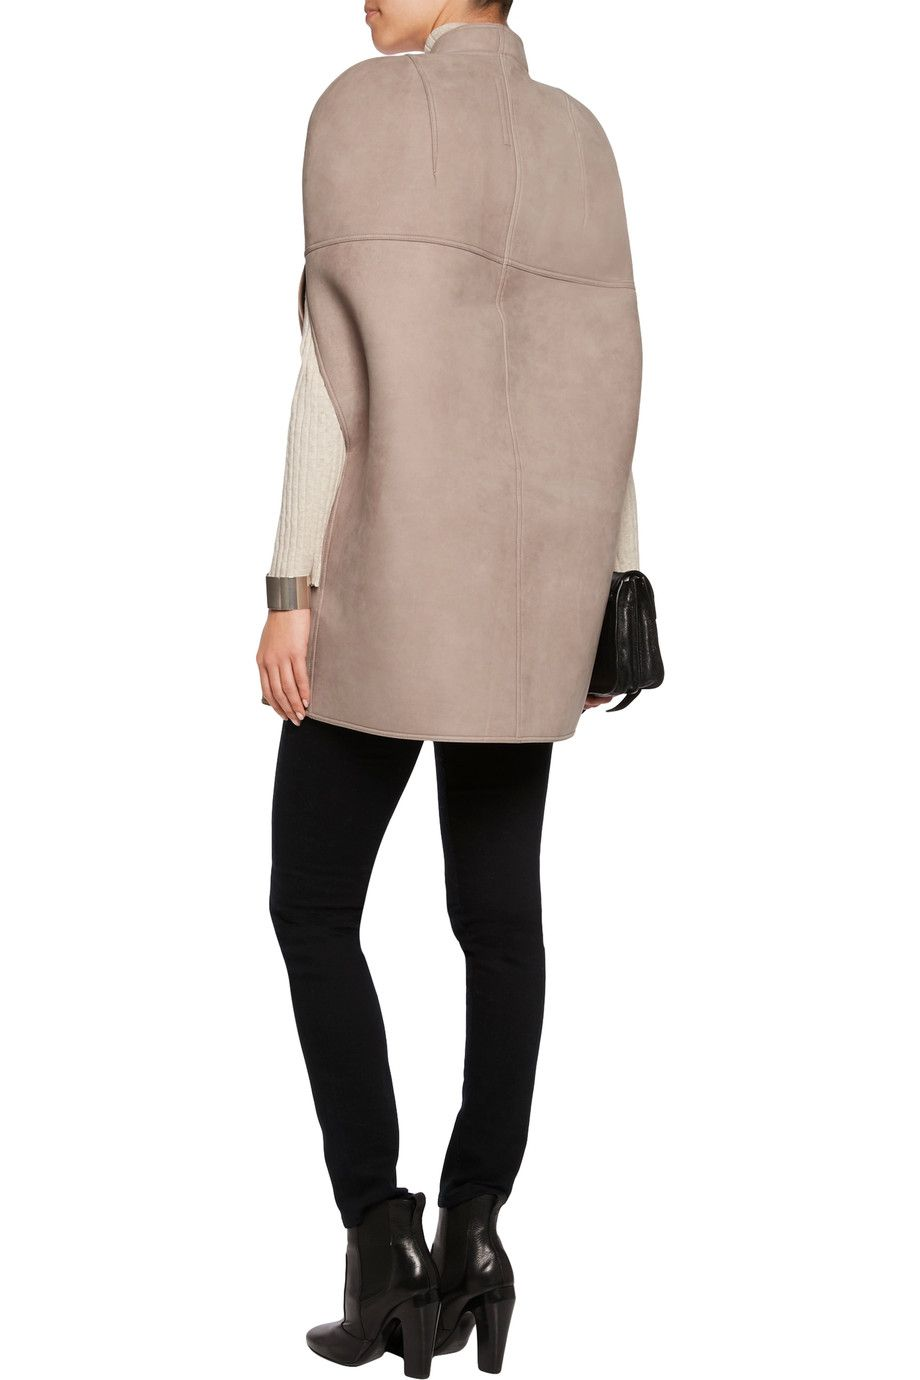 Shop on-sale Rick Owens Lilies suede cape. Browse other discount designer  Jackets &